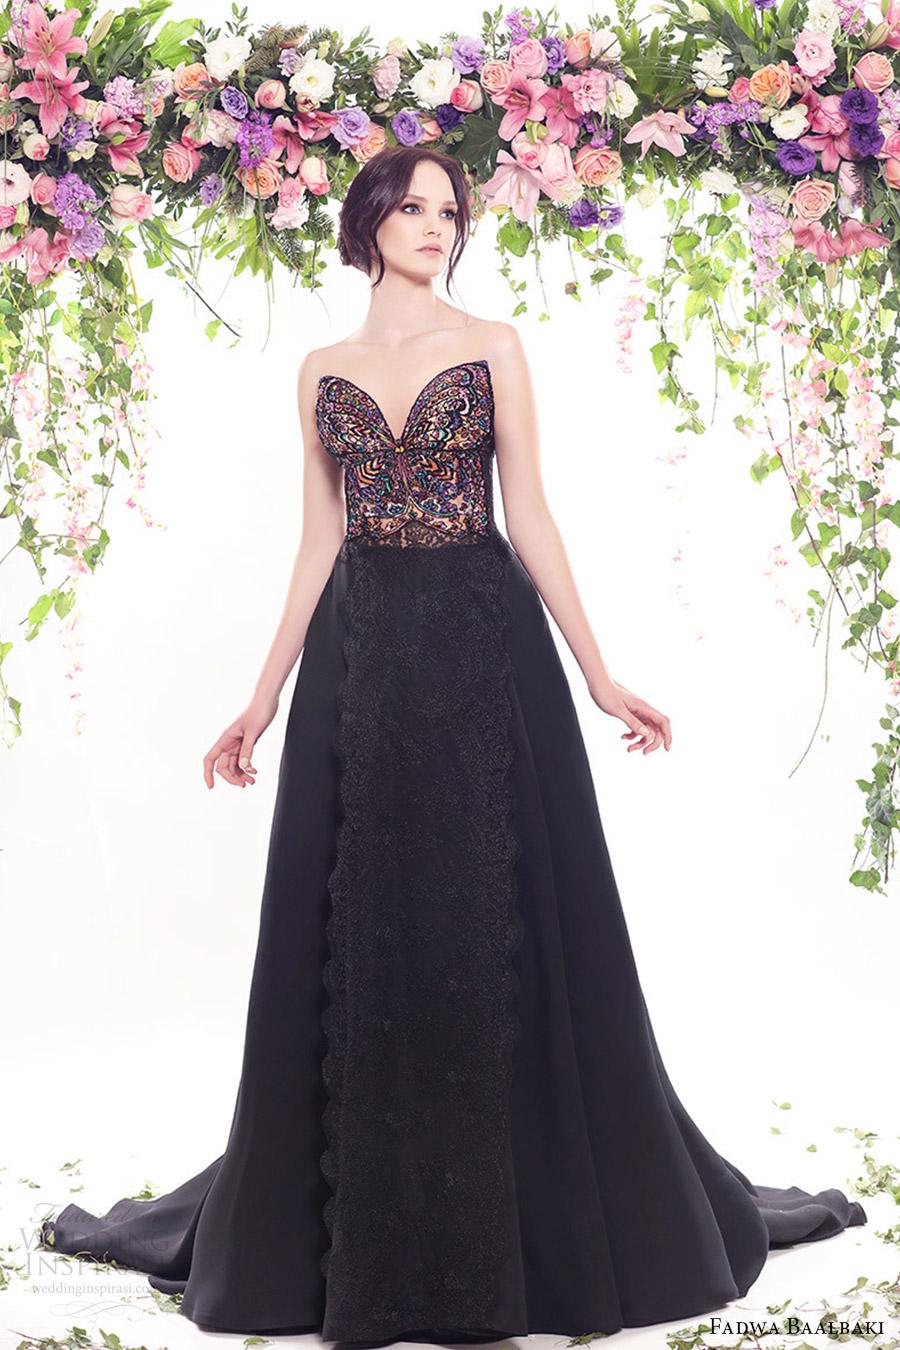 fadwa baalbaki spring 2016 couture strapless sweetheart black ball gown multi color bodice mv